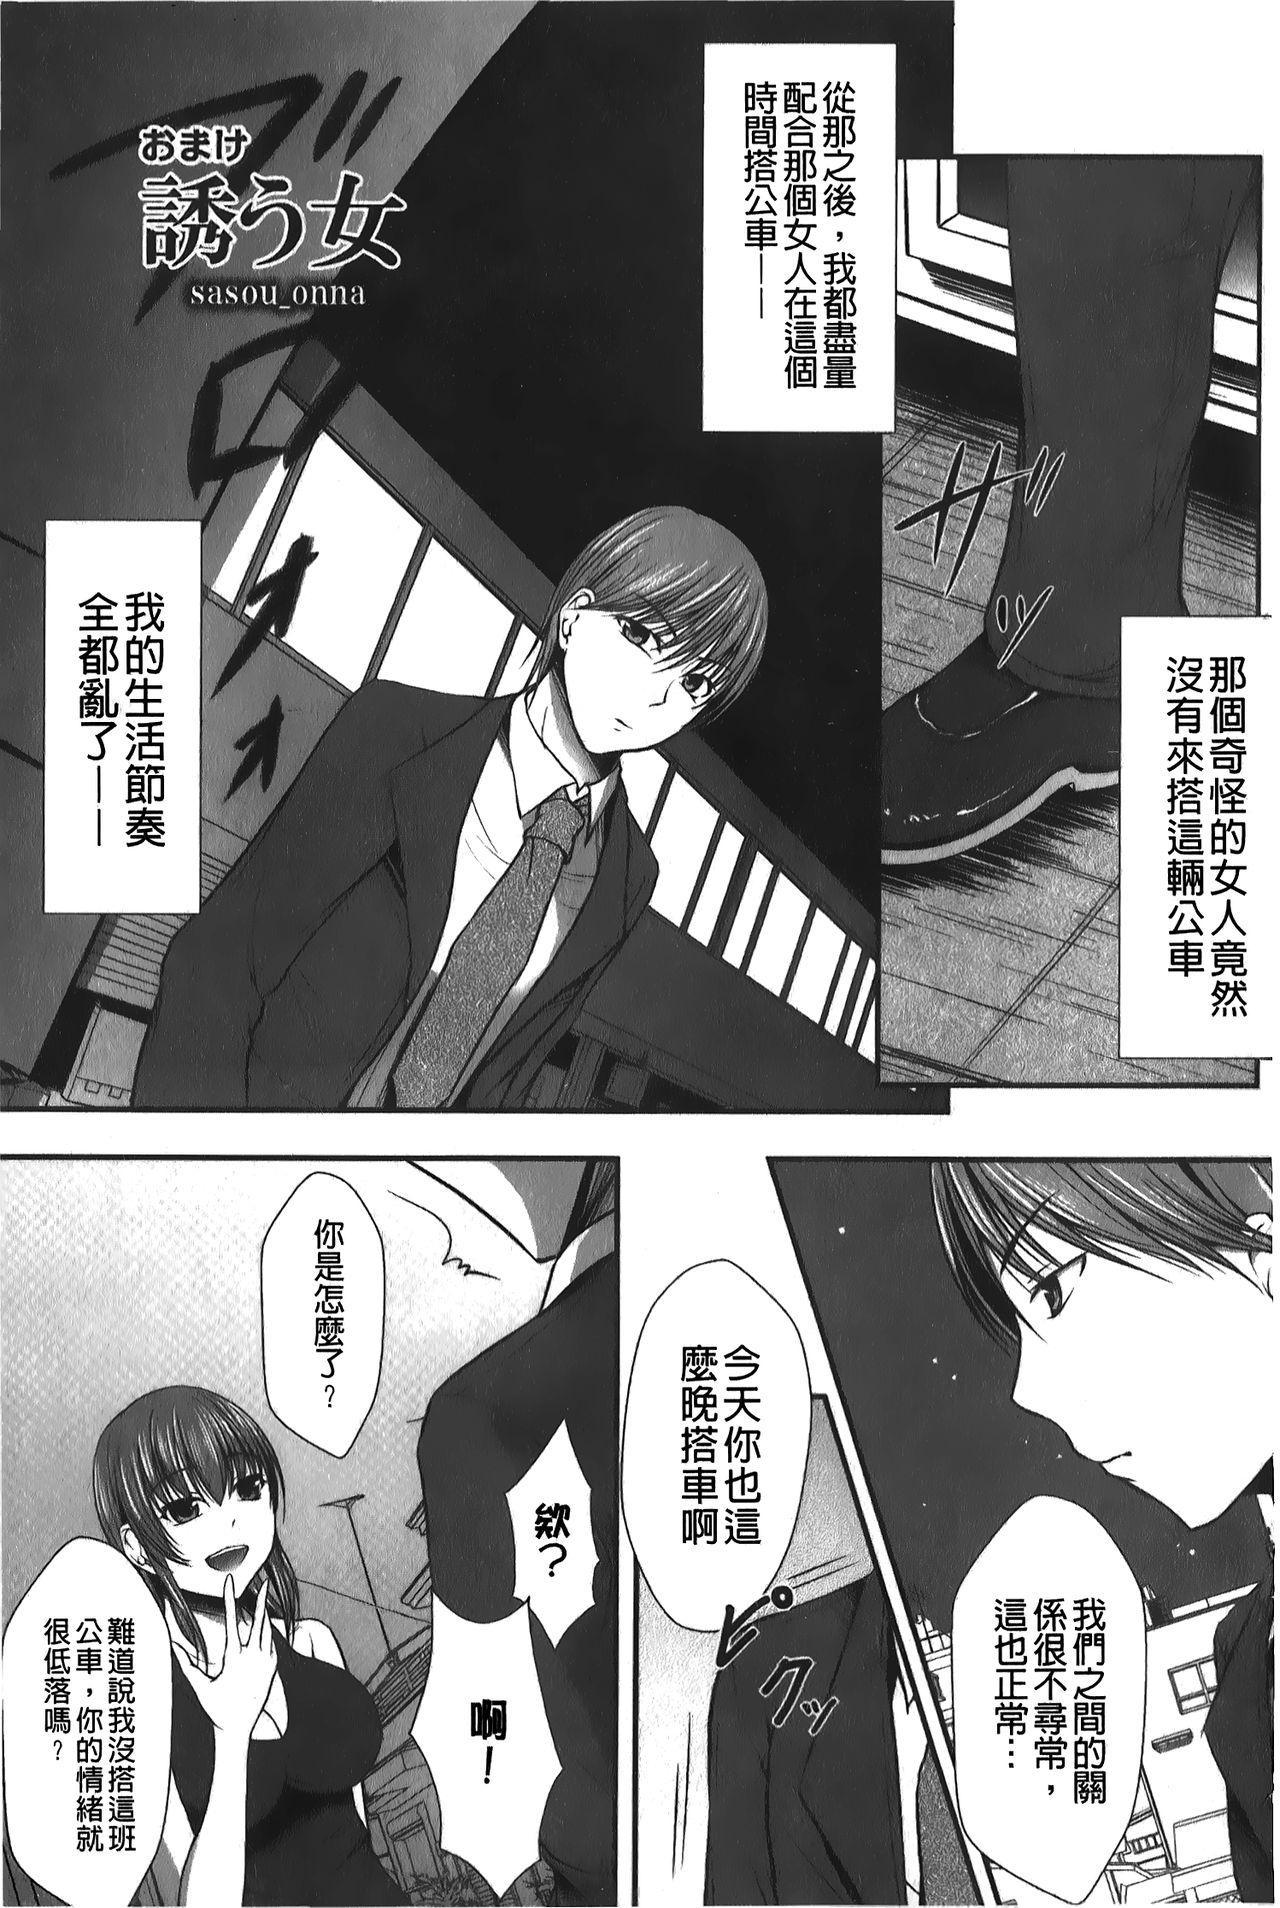 Hameochi | 戳插墮落 163